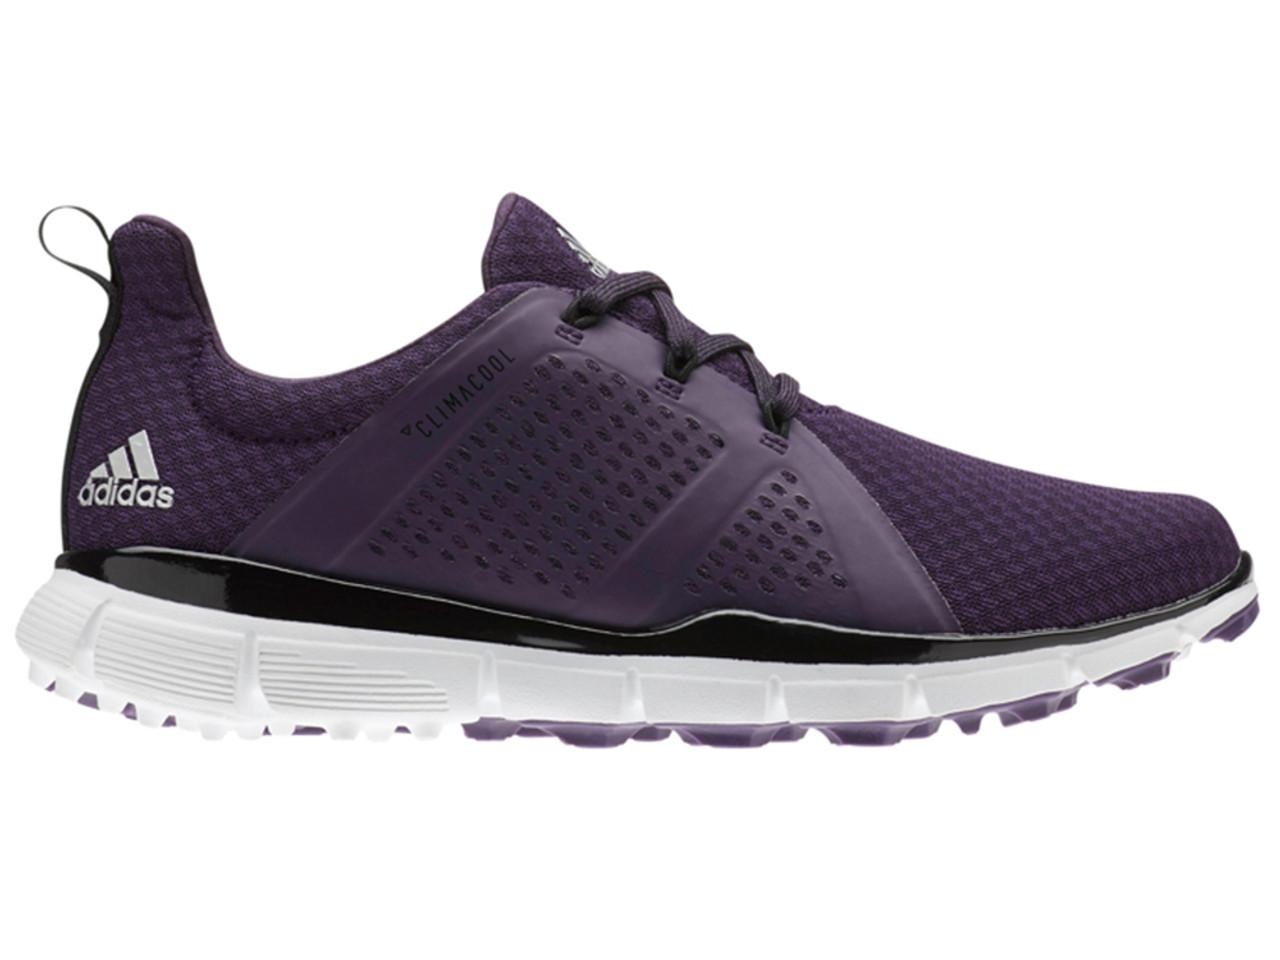 info for 529f1 a9d26 Adidas W Climacool Cage Golf Shoes - Legend Purple Black